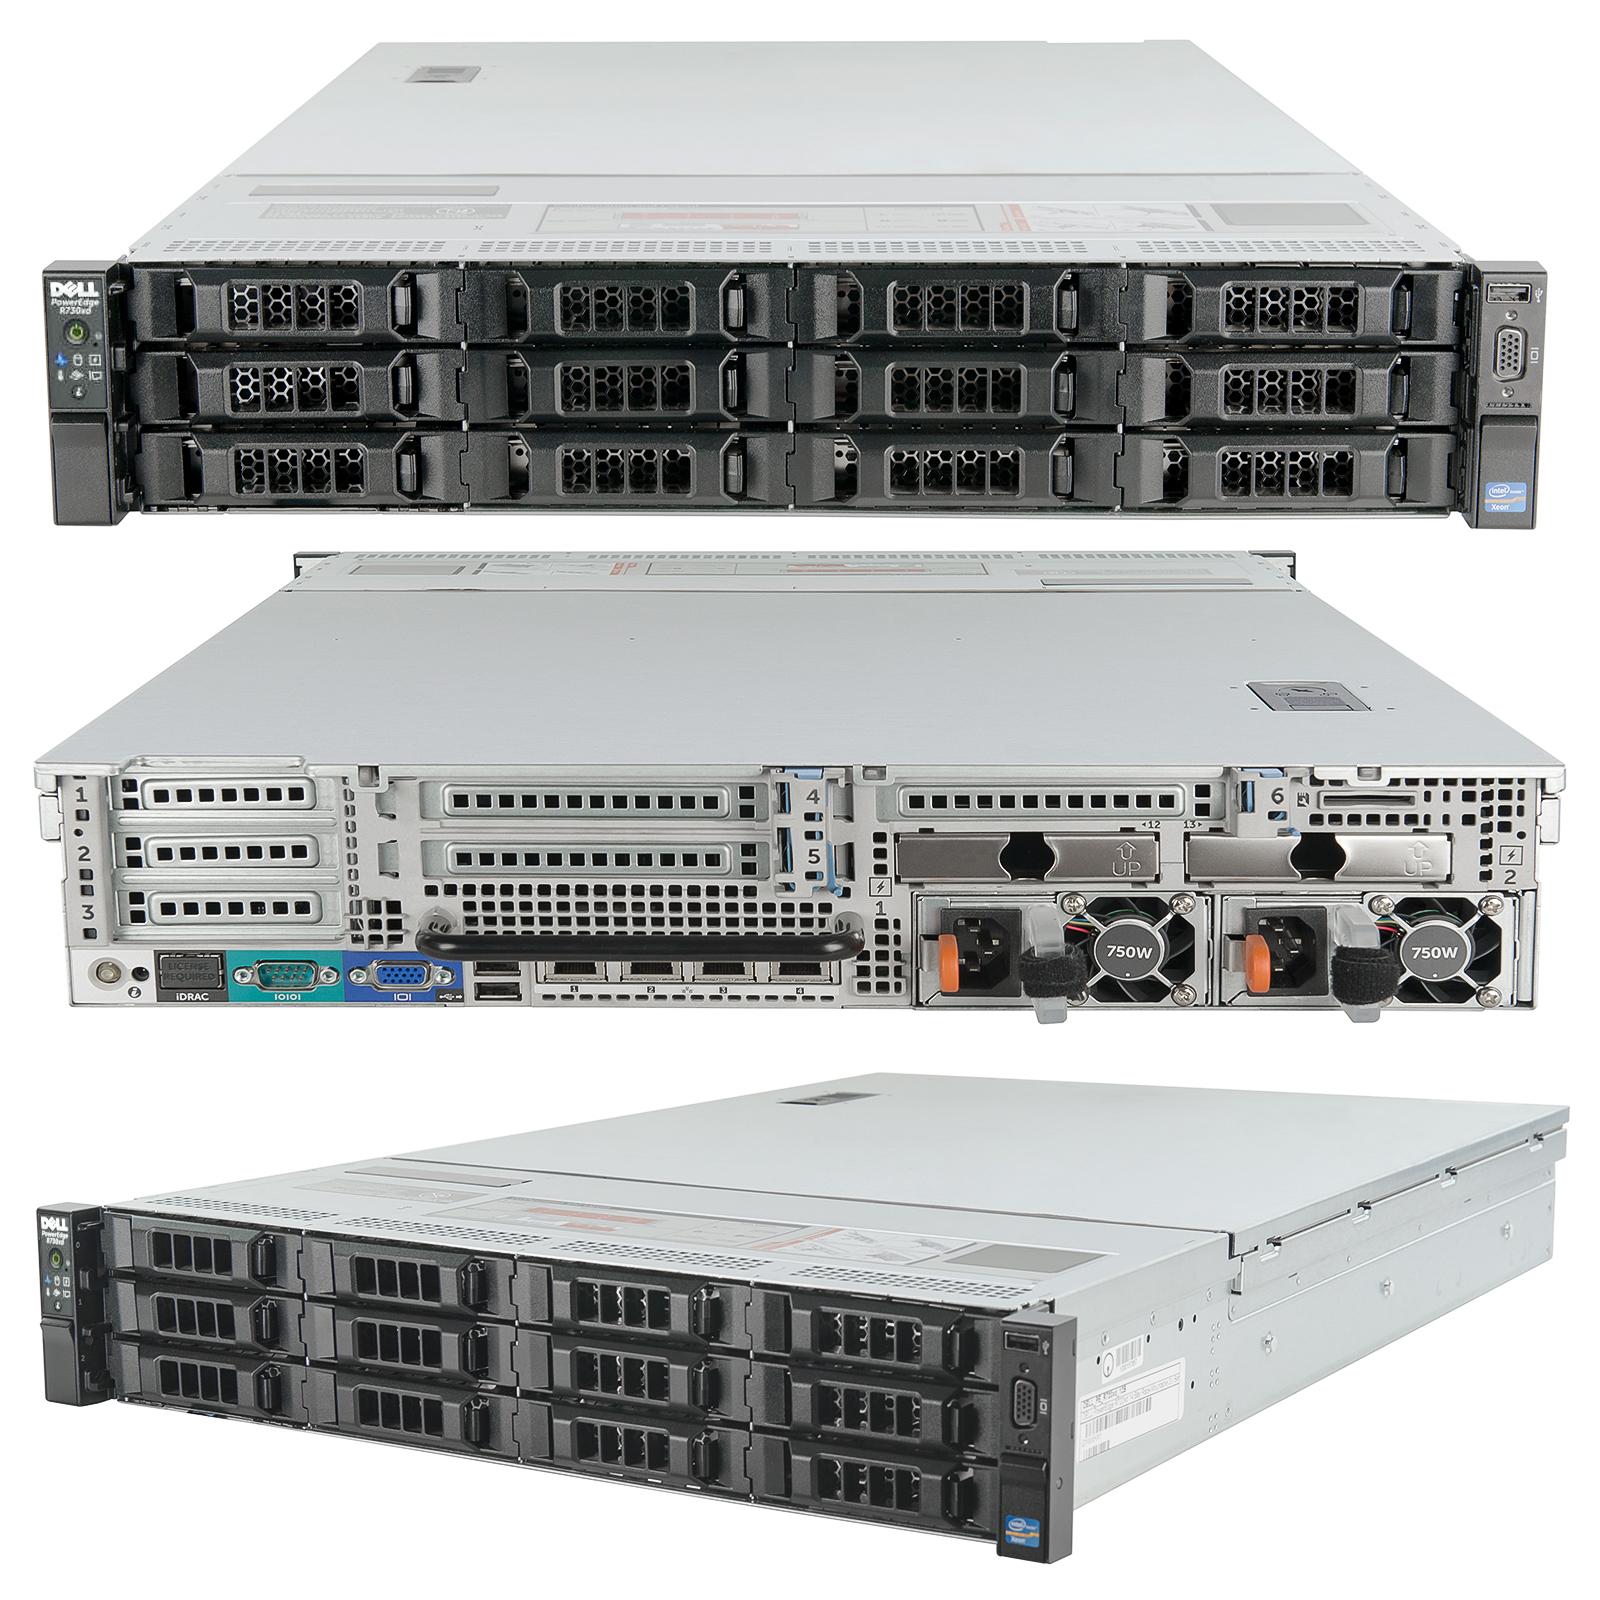 Details about Dell PowerEdge R730xd Server 2x 2 50Ghz E5-2680v3 12C 96GB  1 0TB SSD + 72TB